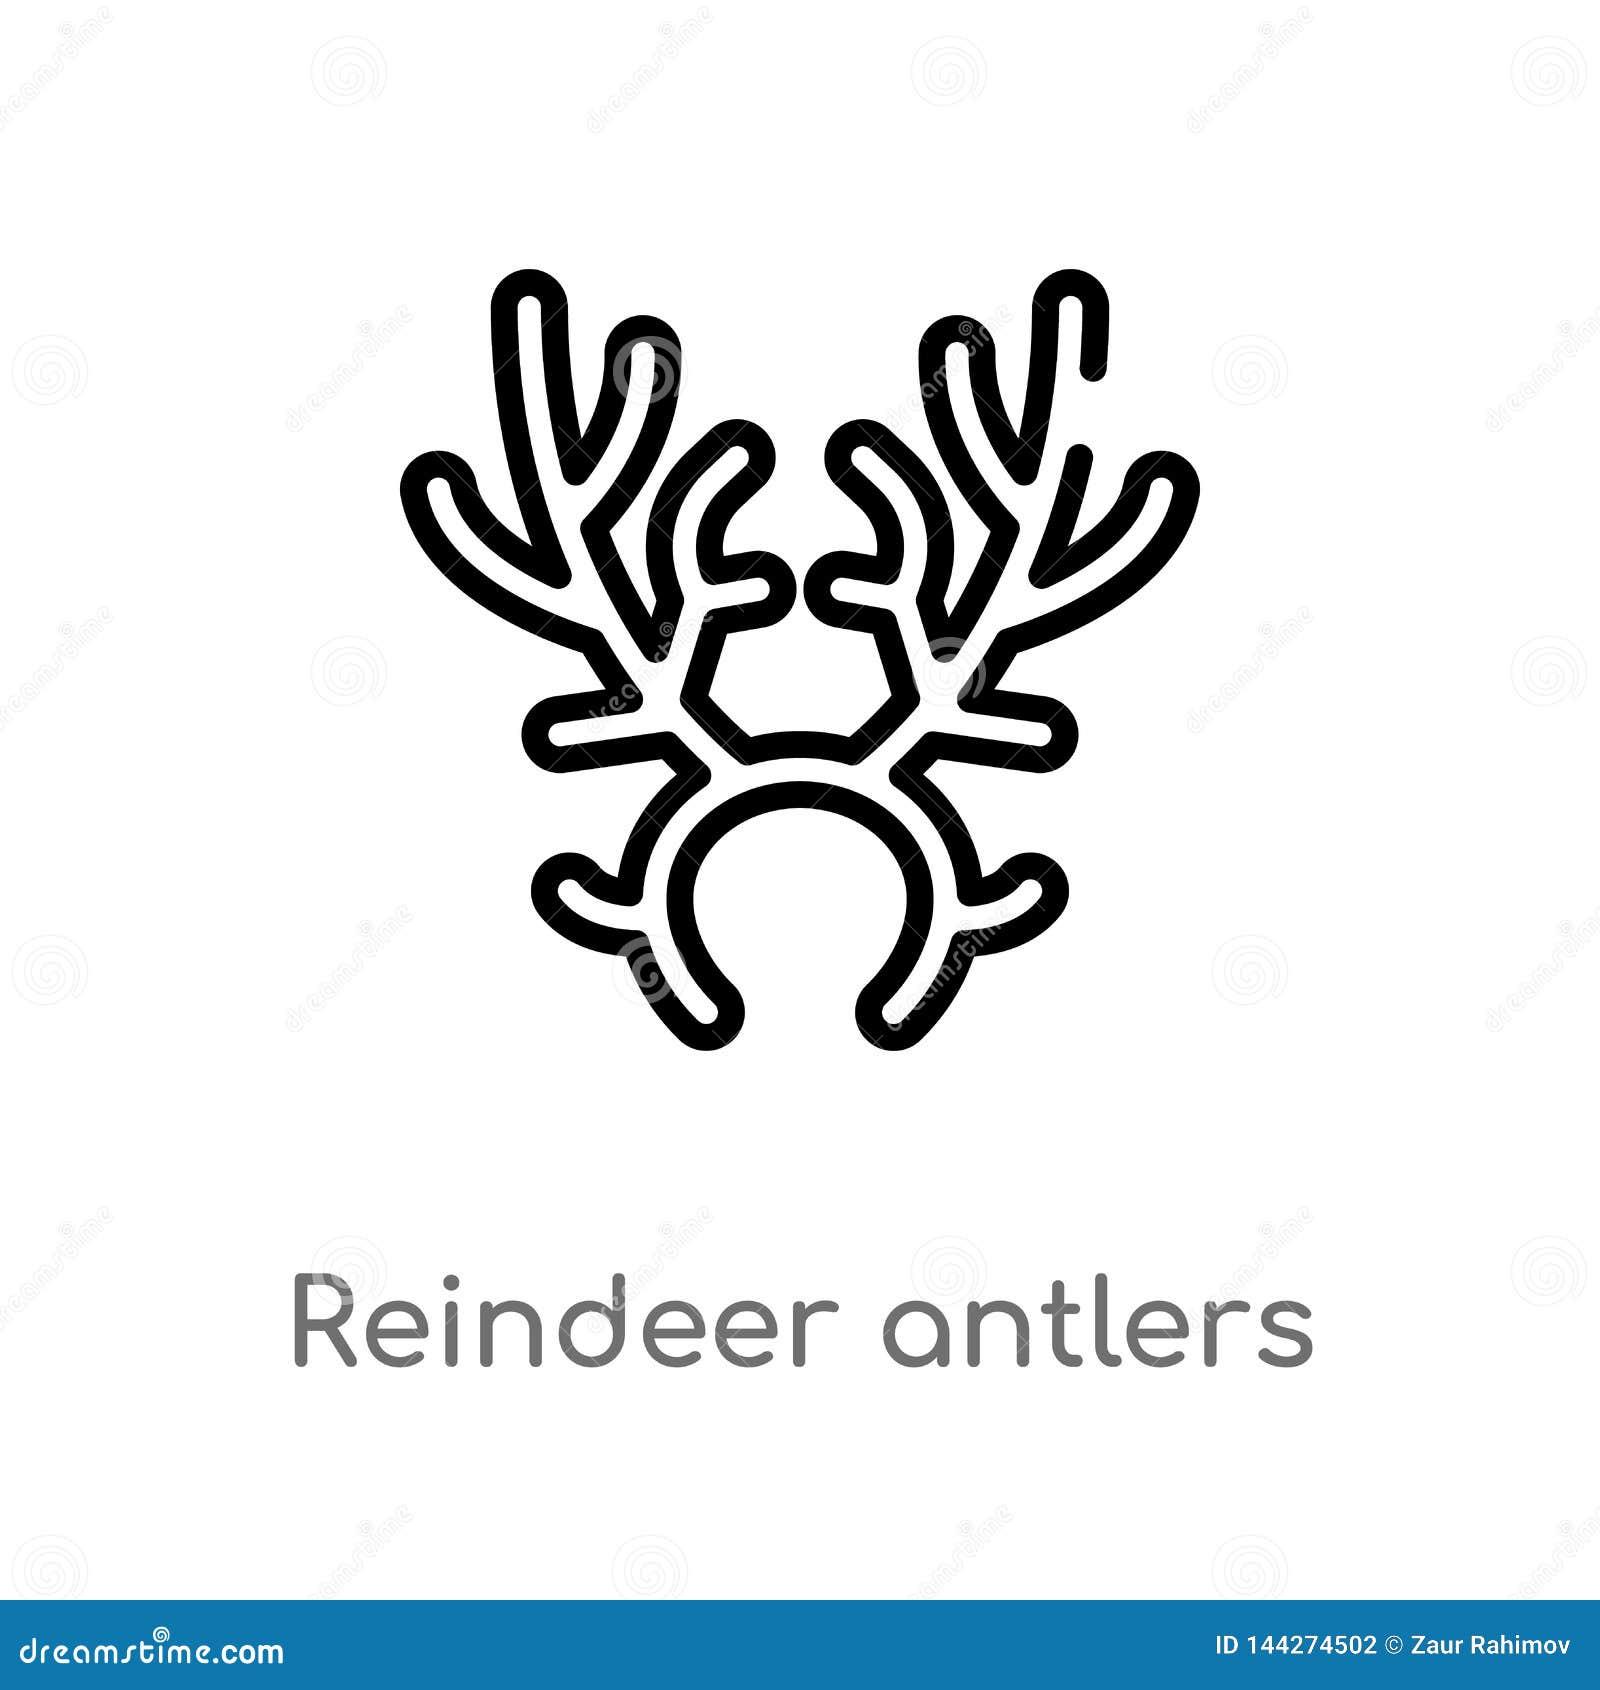 Best Templates: Reindeer Antler Outline